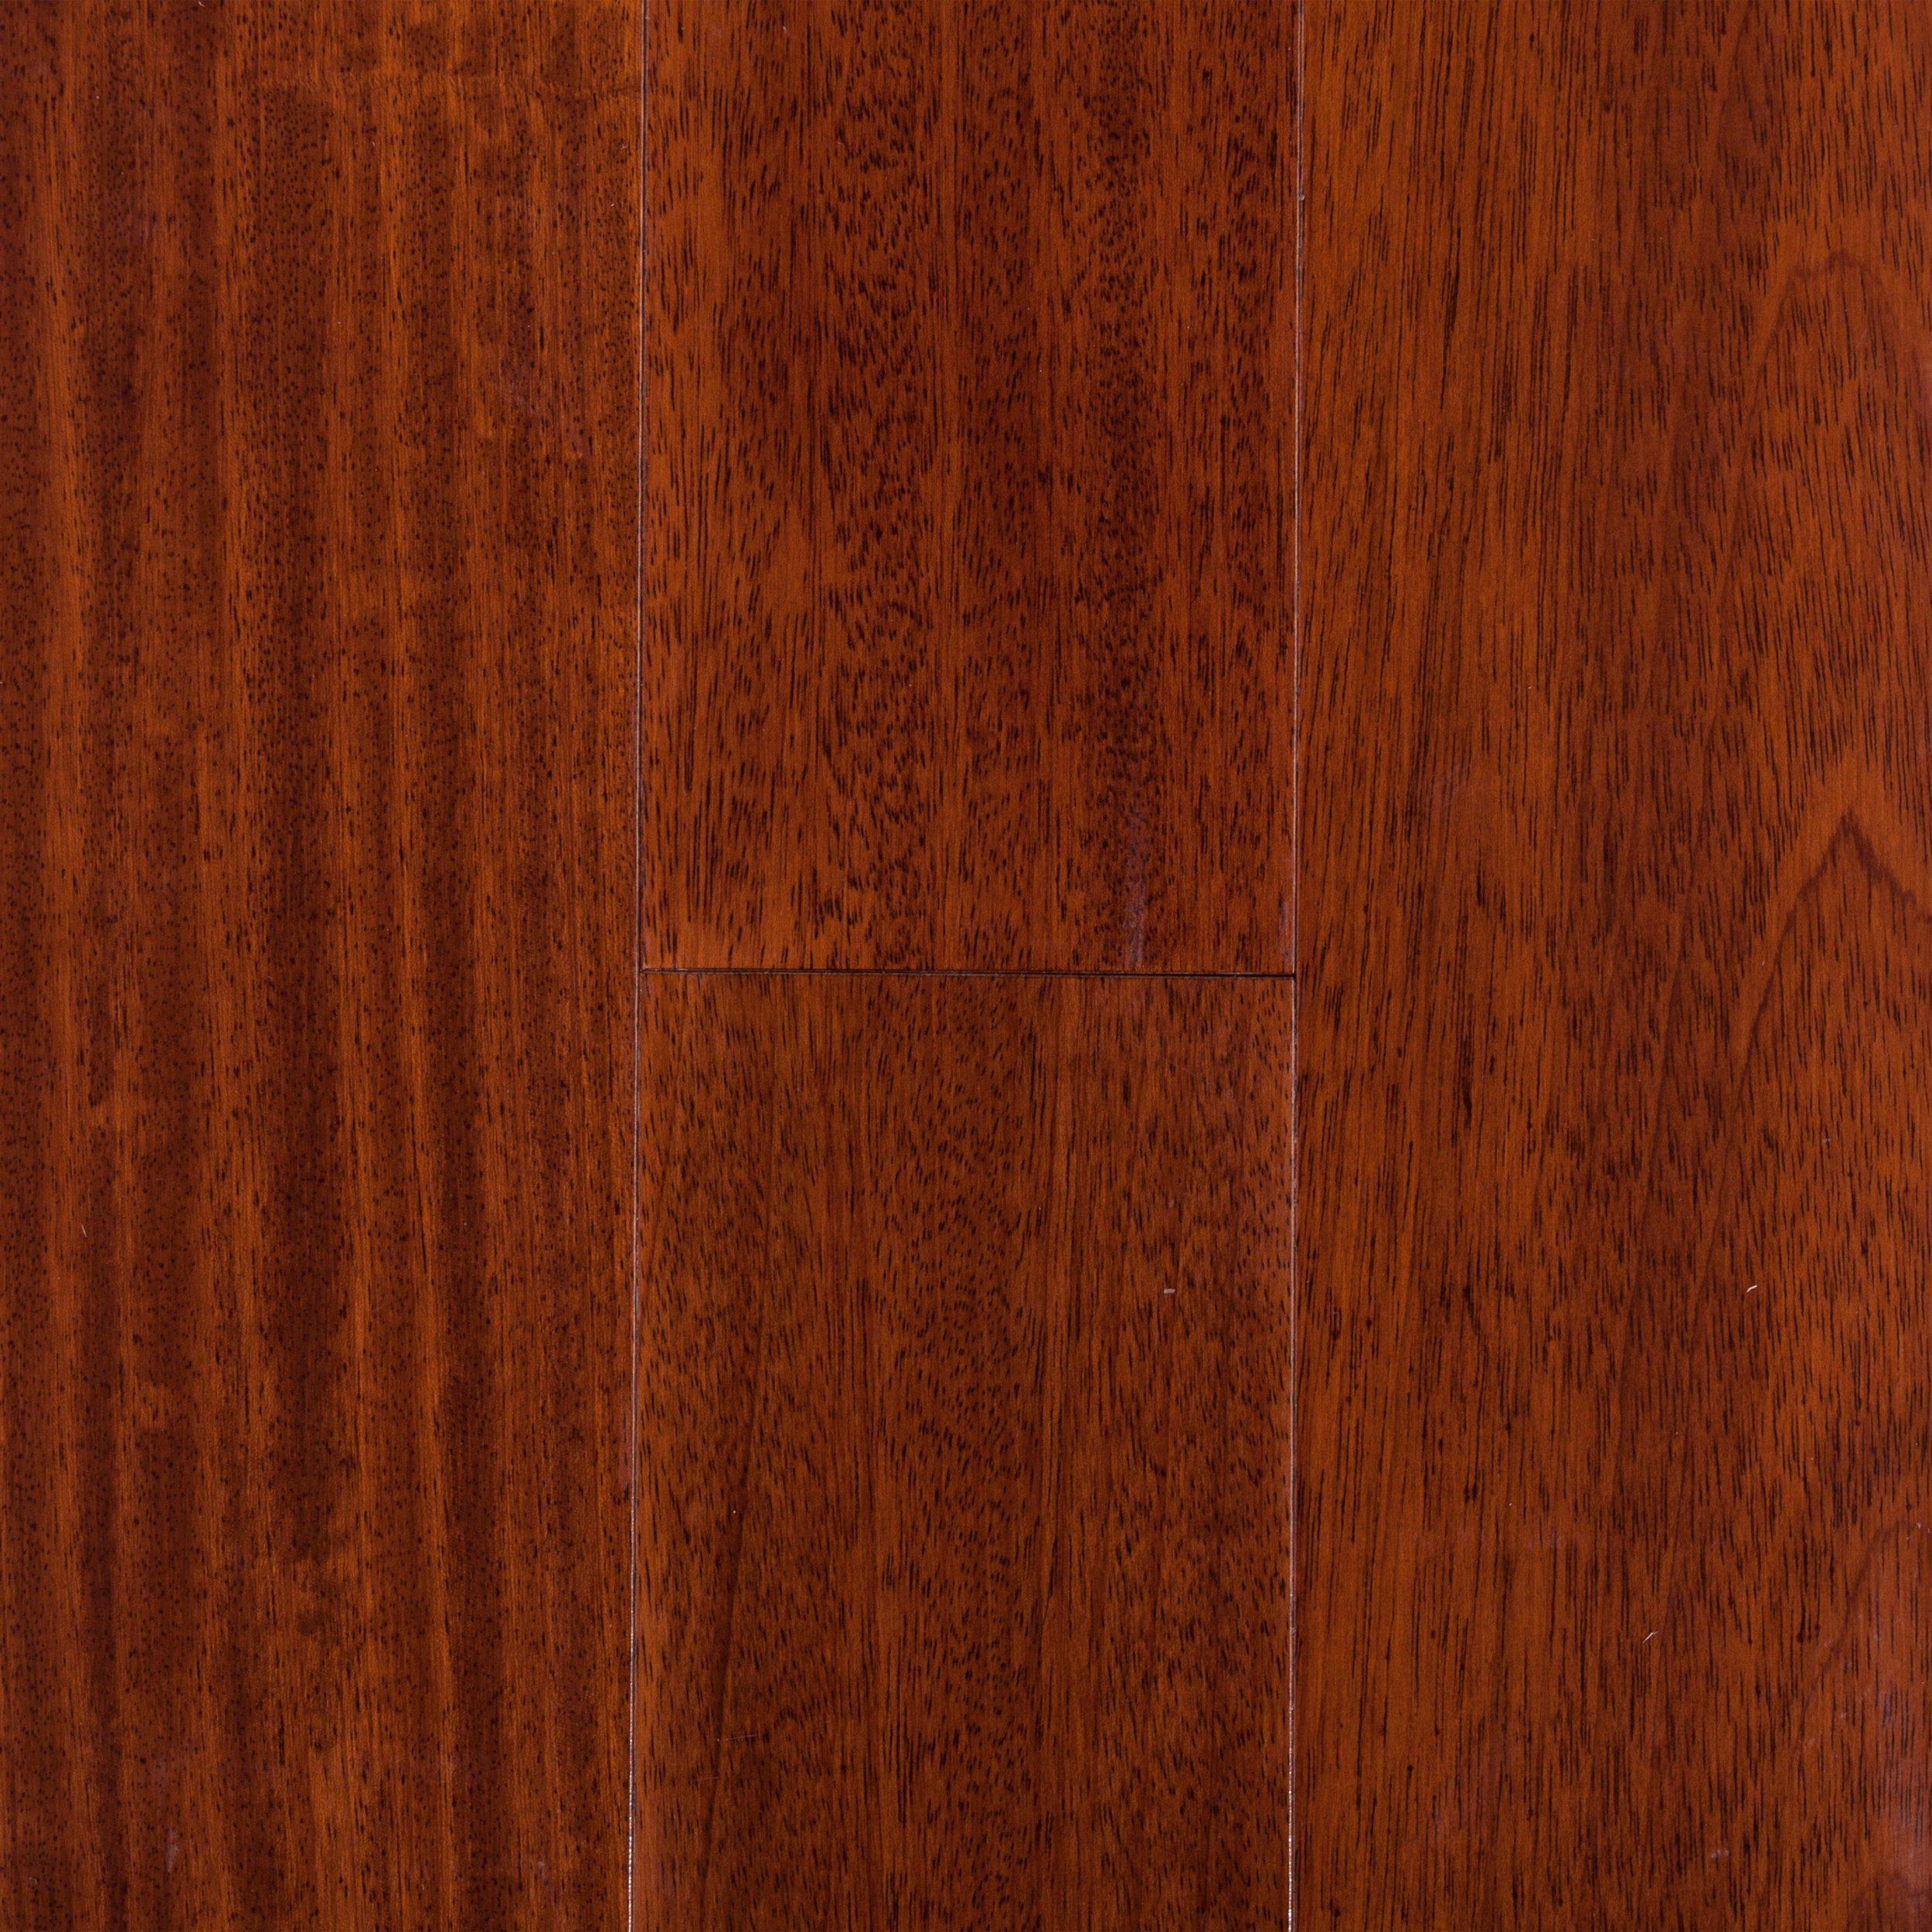 Natural Brazilian Cherry Smooth Engineered Hardwood